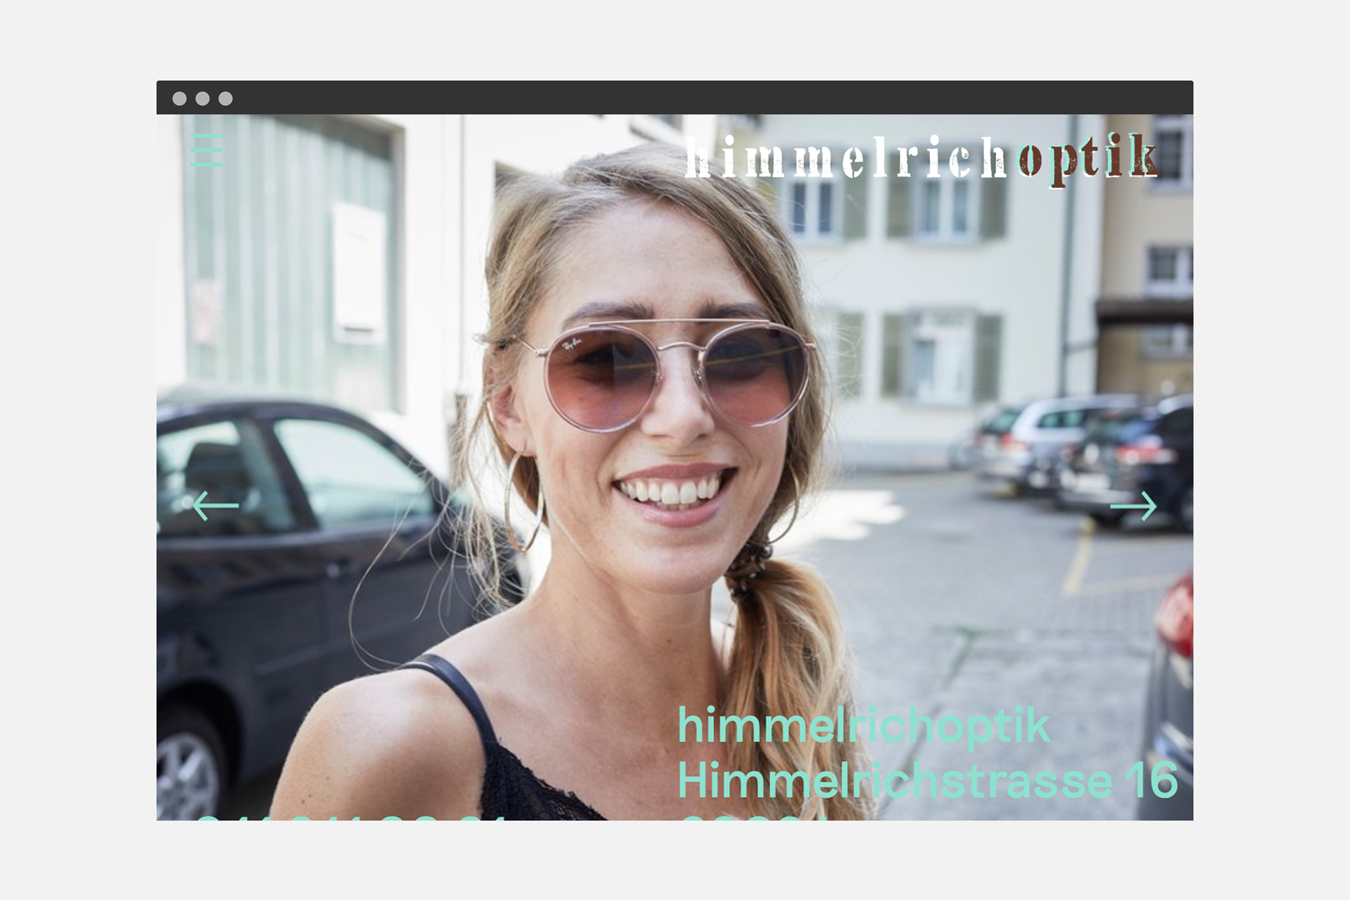 Pfistergasseoptik Himmelrichoptik Website